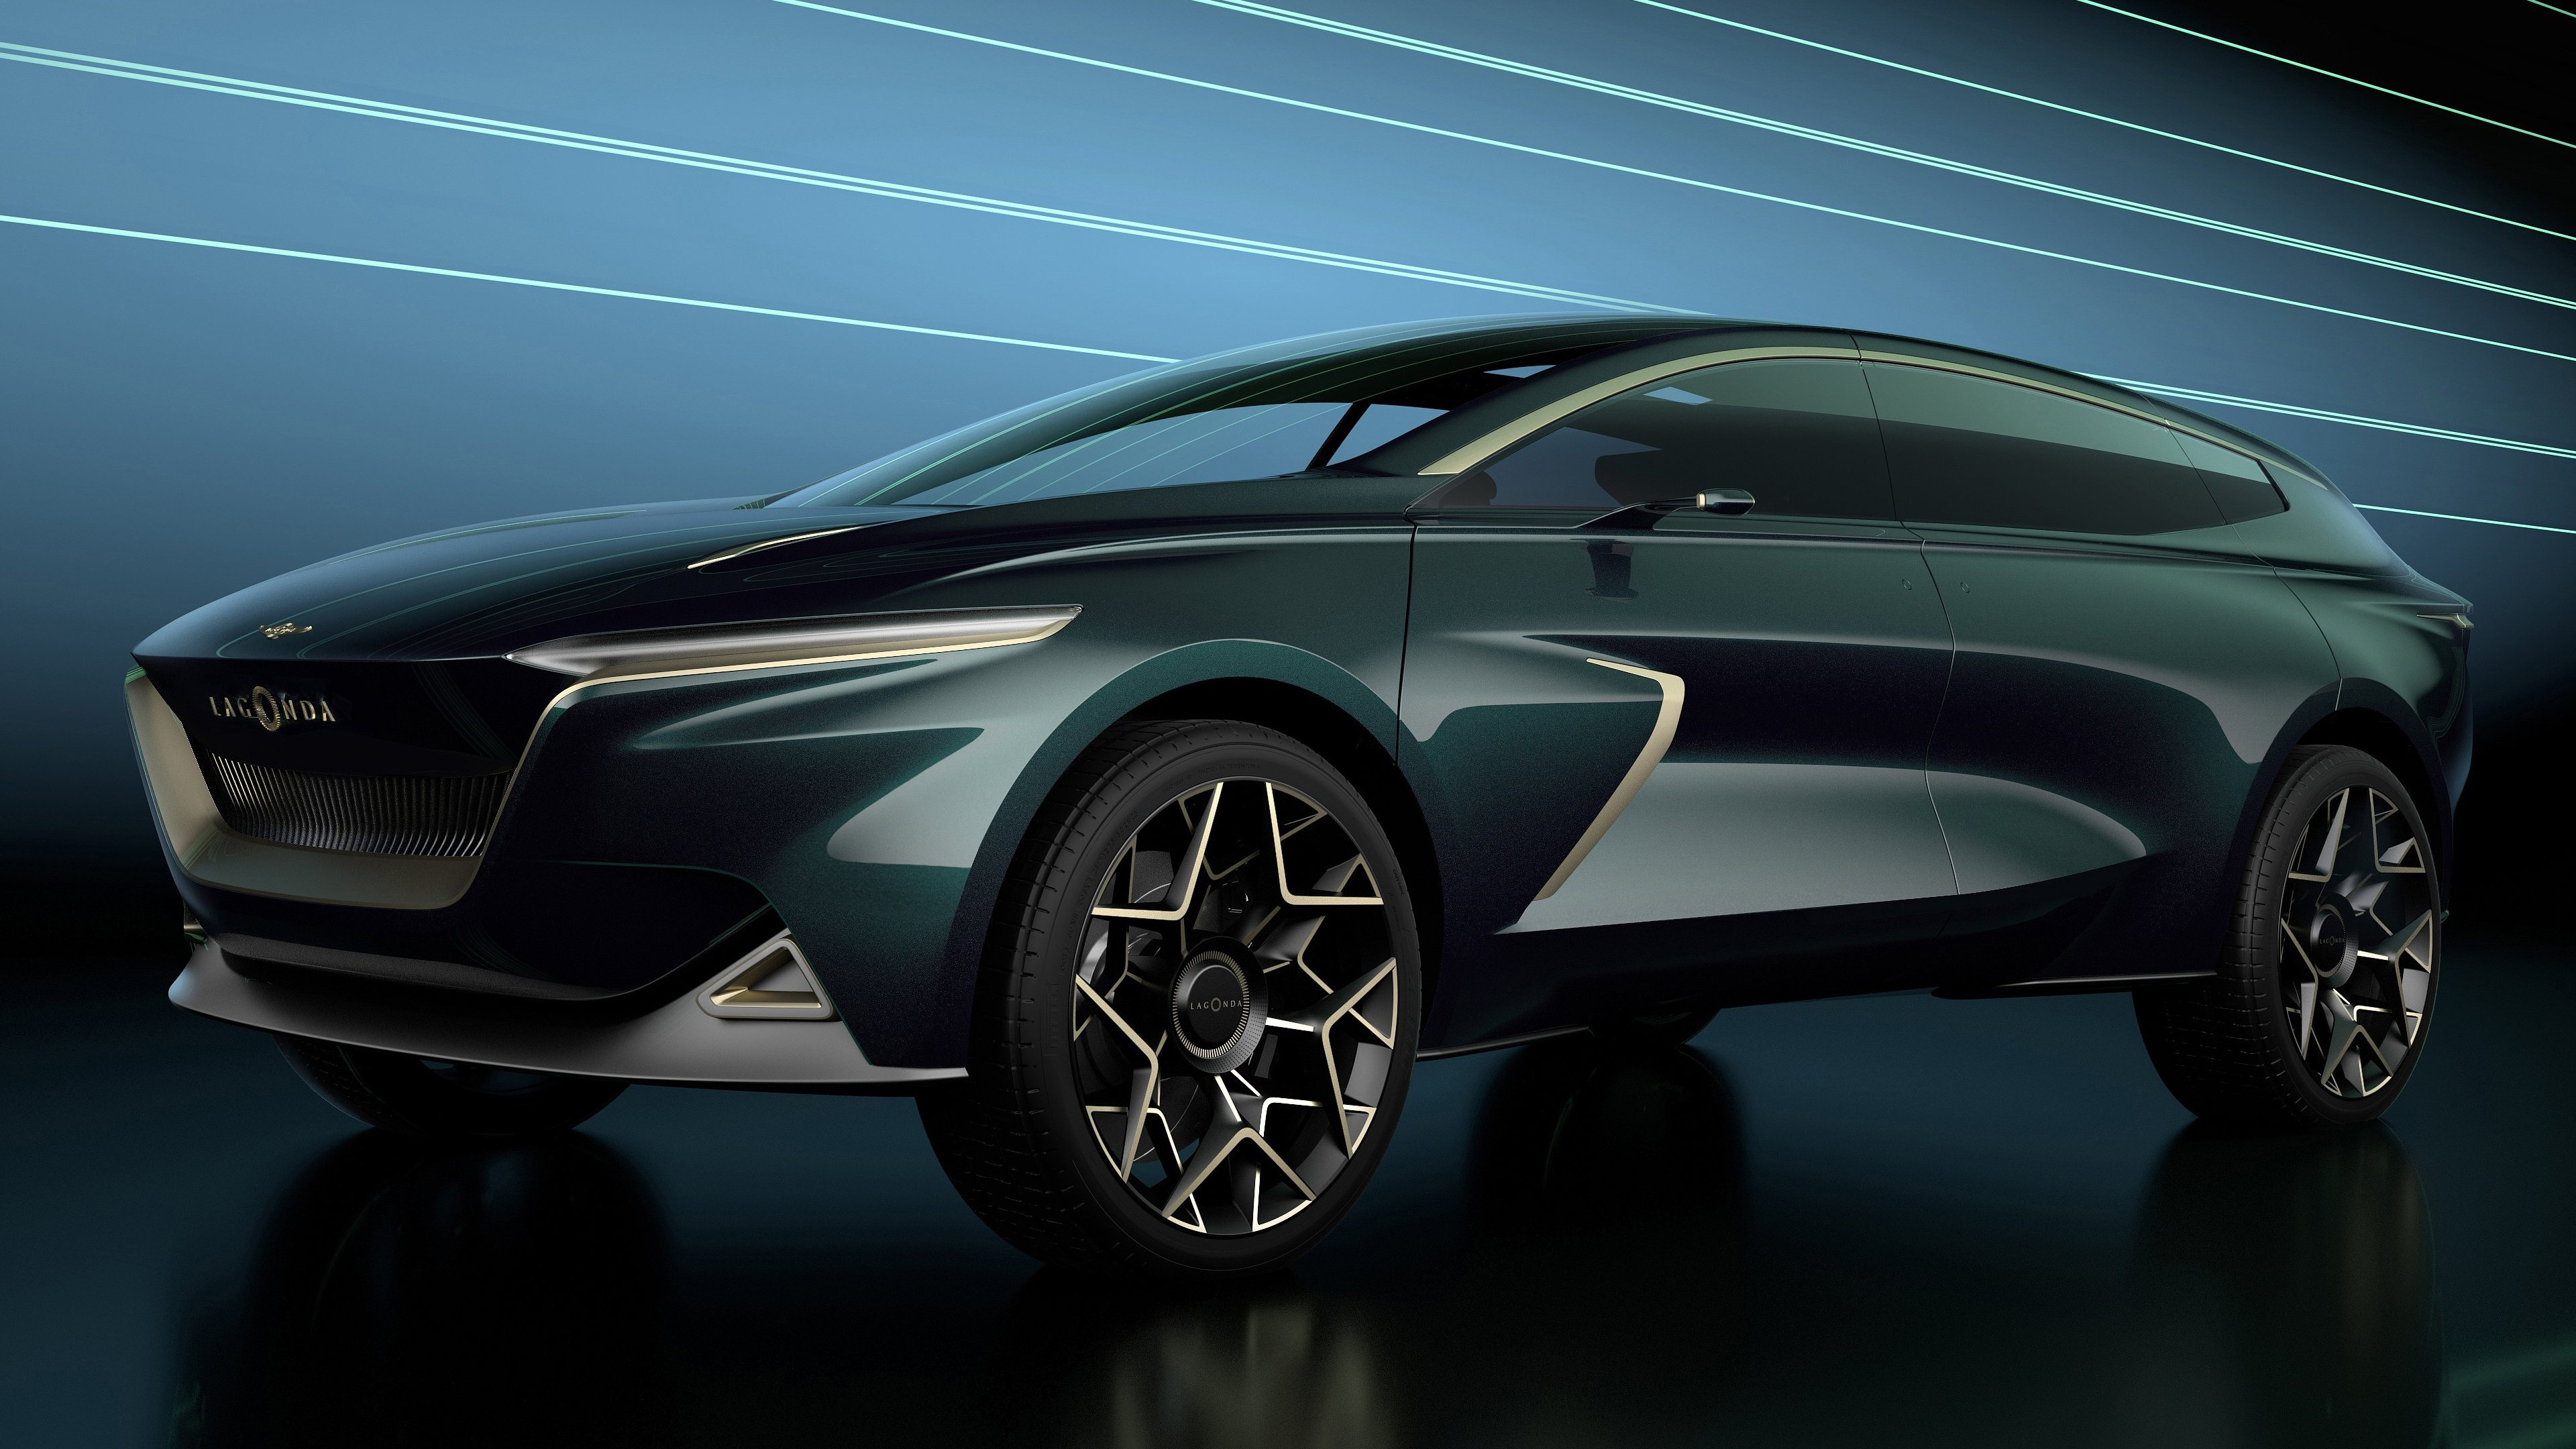 4k Wallpaper Of 2019 Aston Martin Lagonda All Terrain